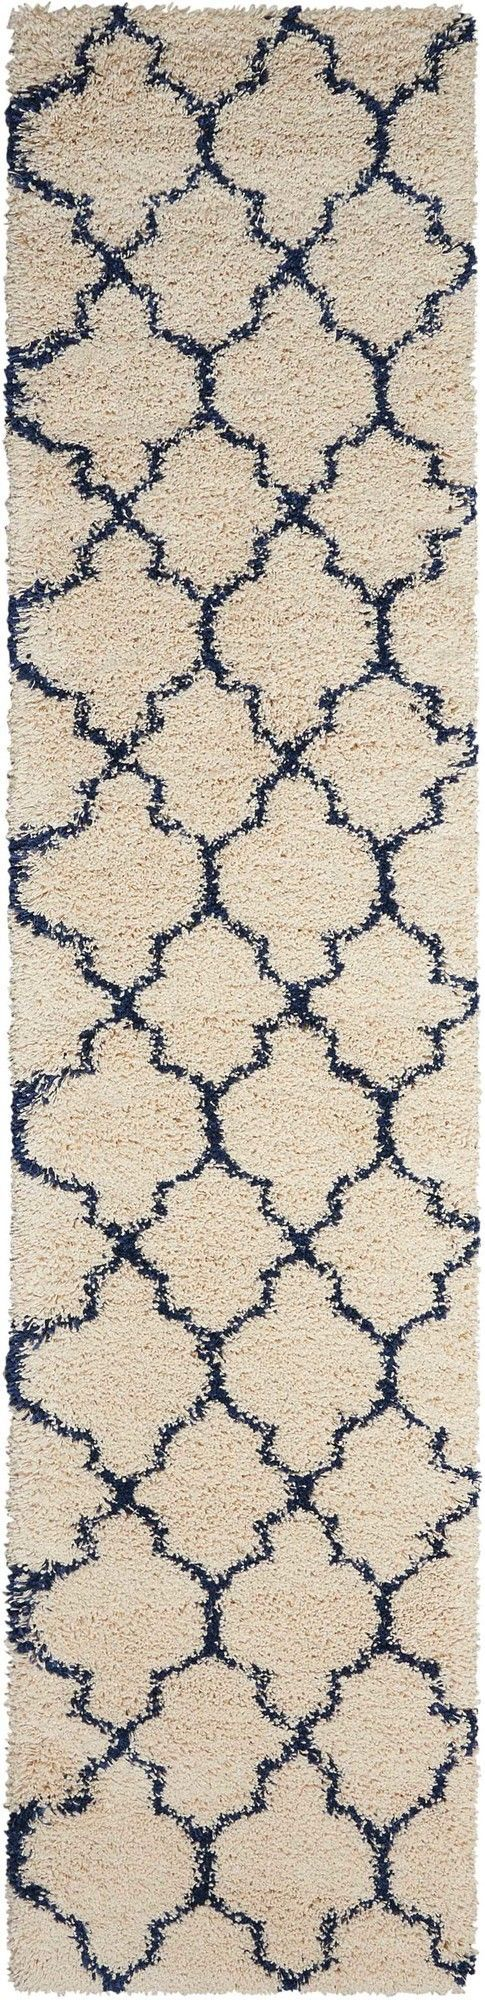 Amore Ivory/Blue Area Rug